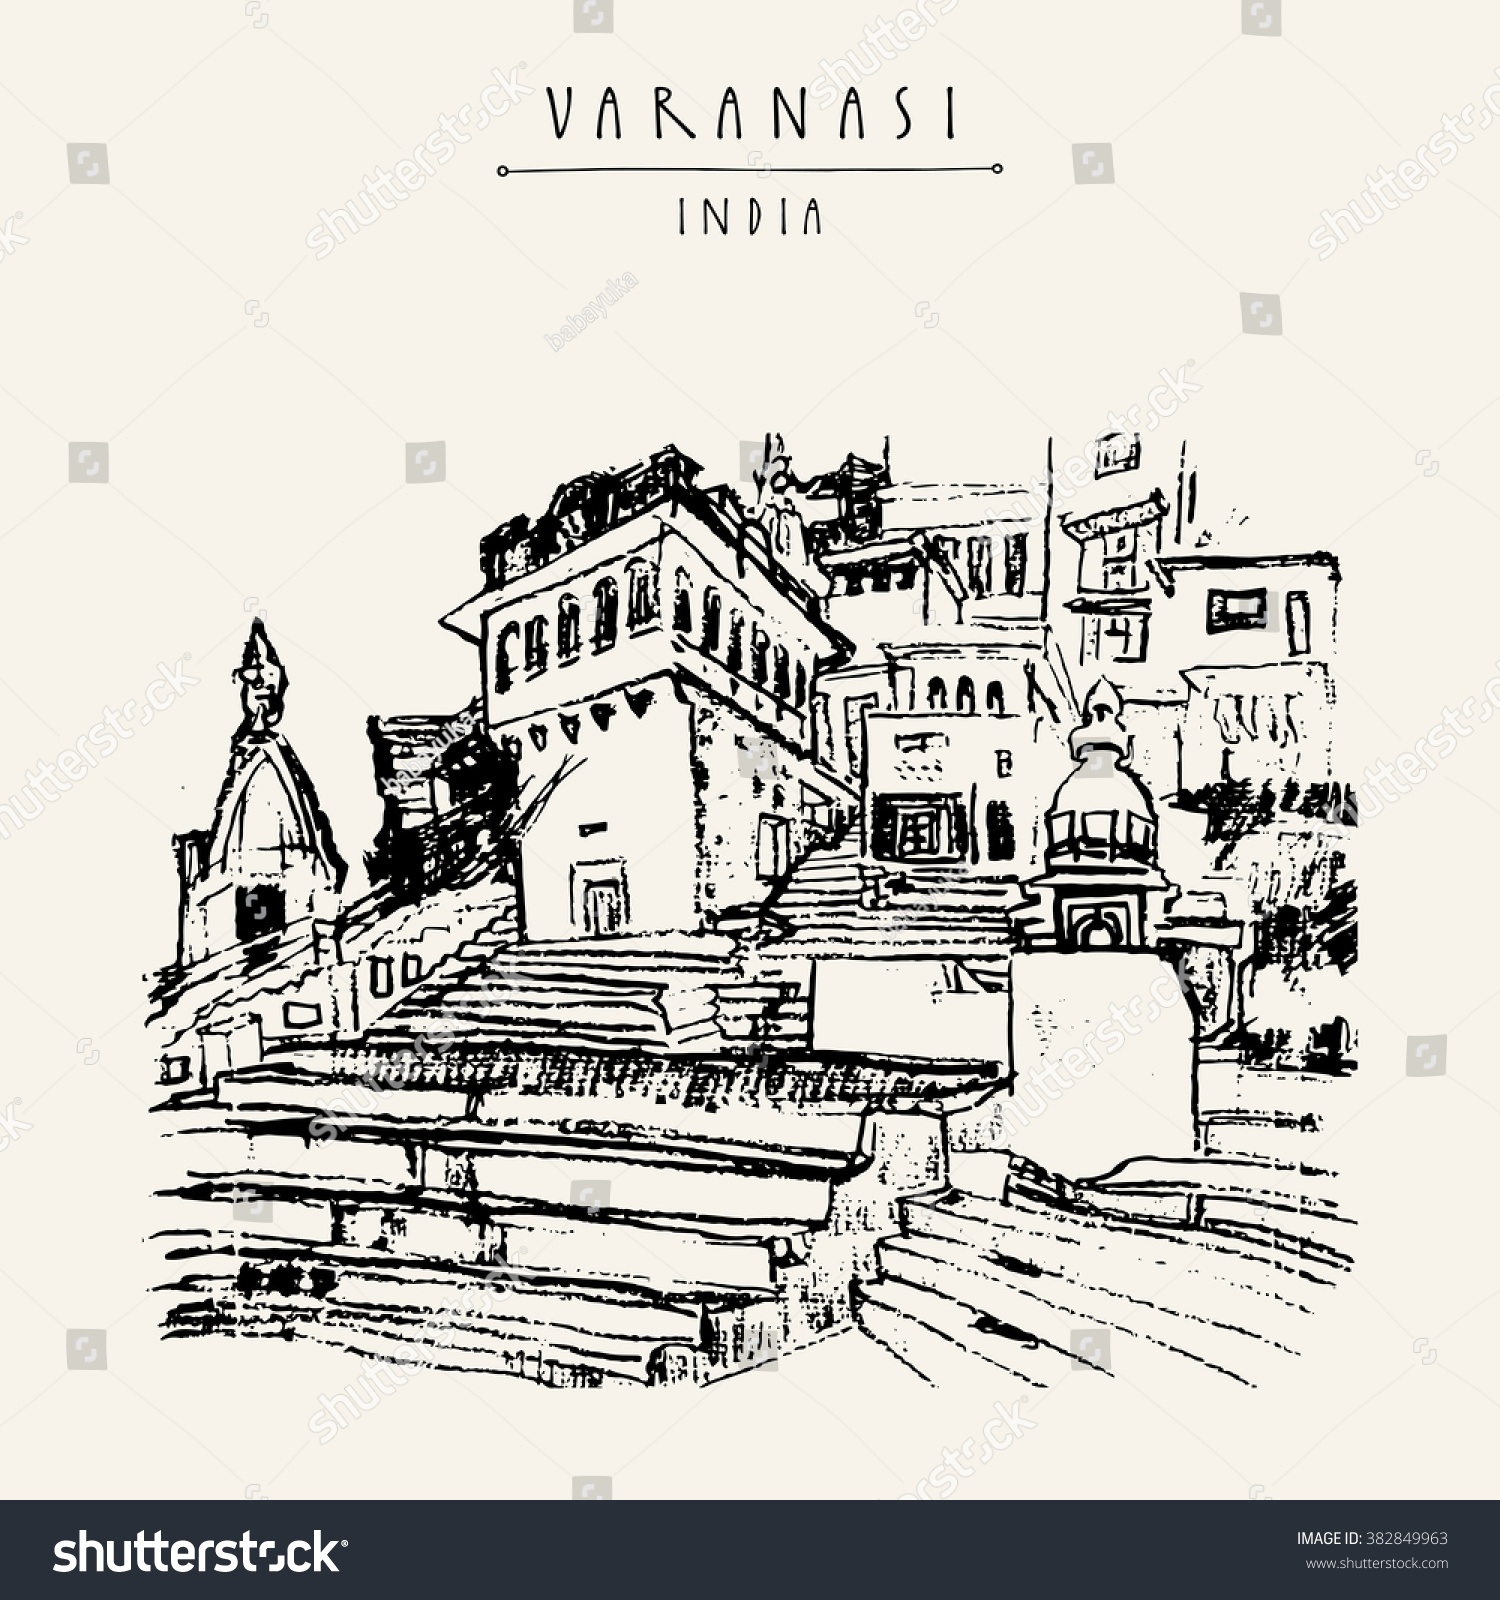 Ghat Varanasi Uttar Pradesh India Hand Stock Vector (Royalty Free ...